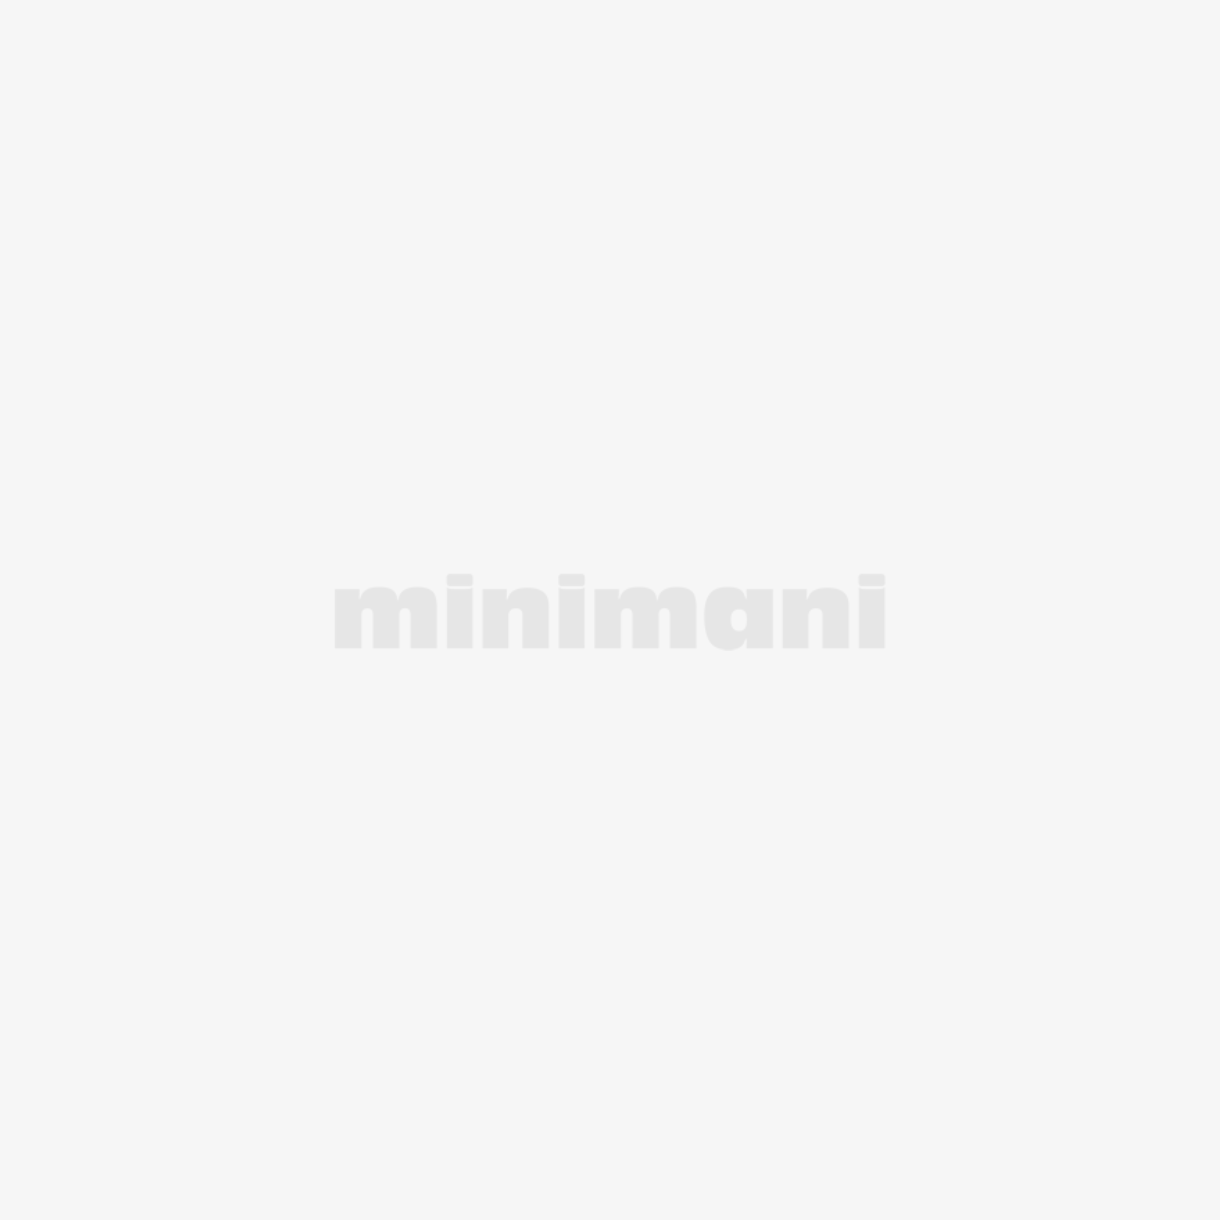 SUIHKUVERHO HOT SHOWER 180x200